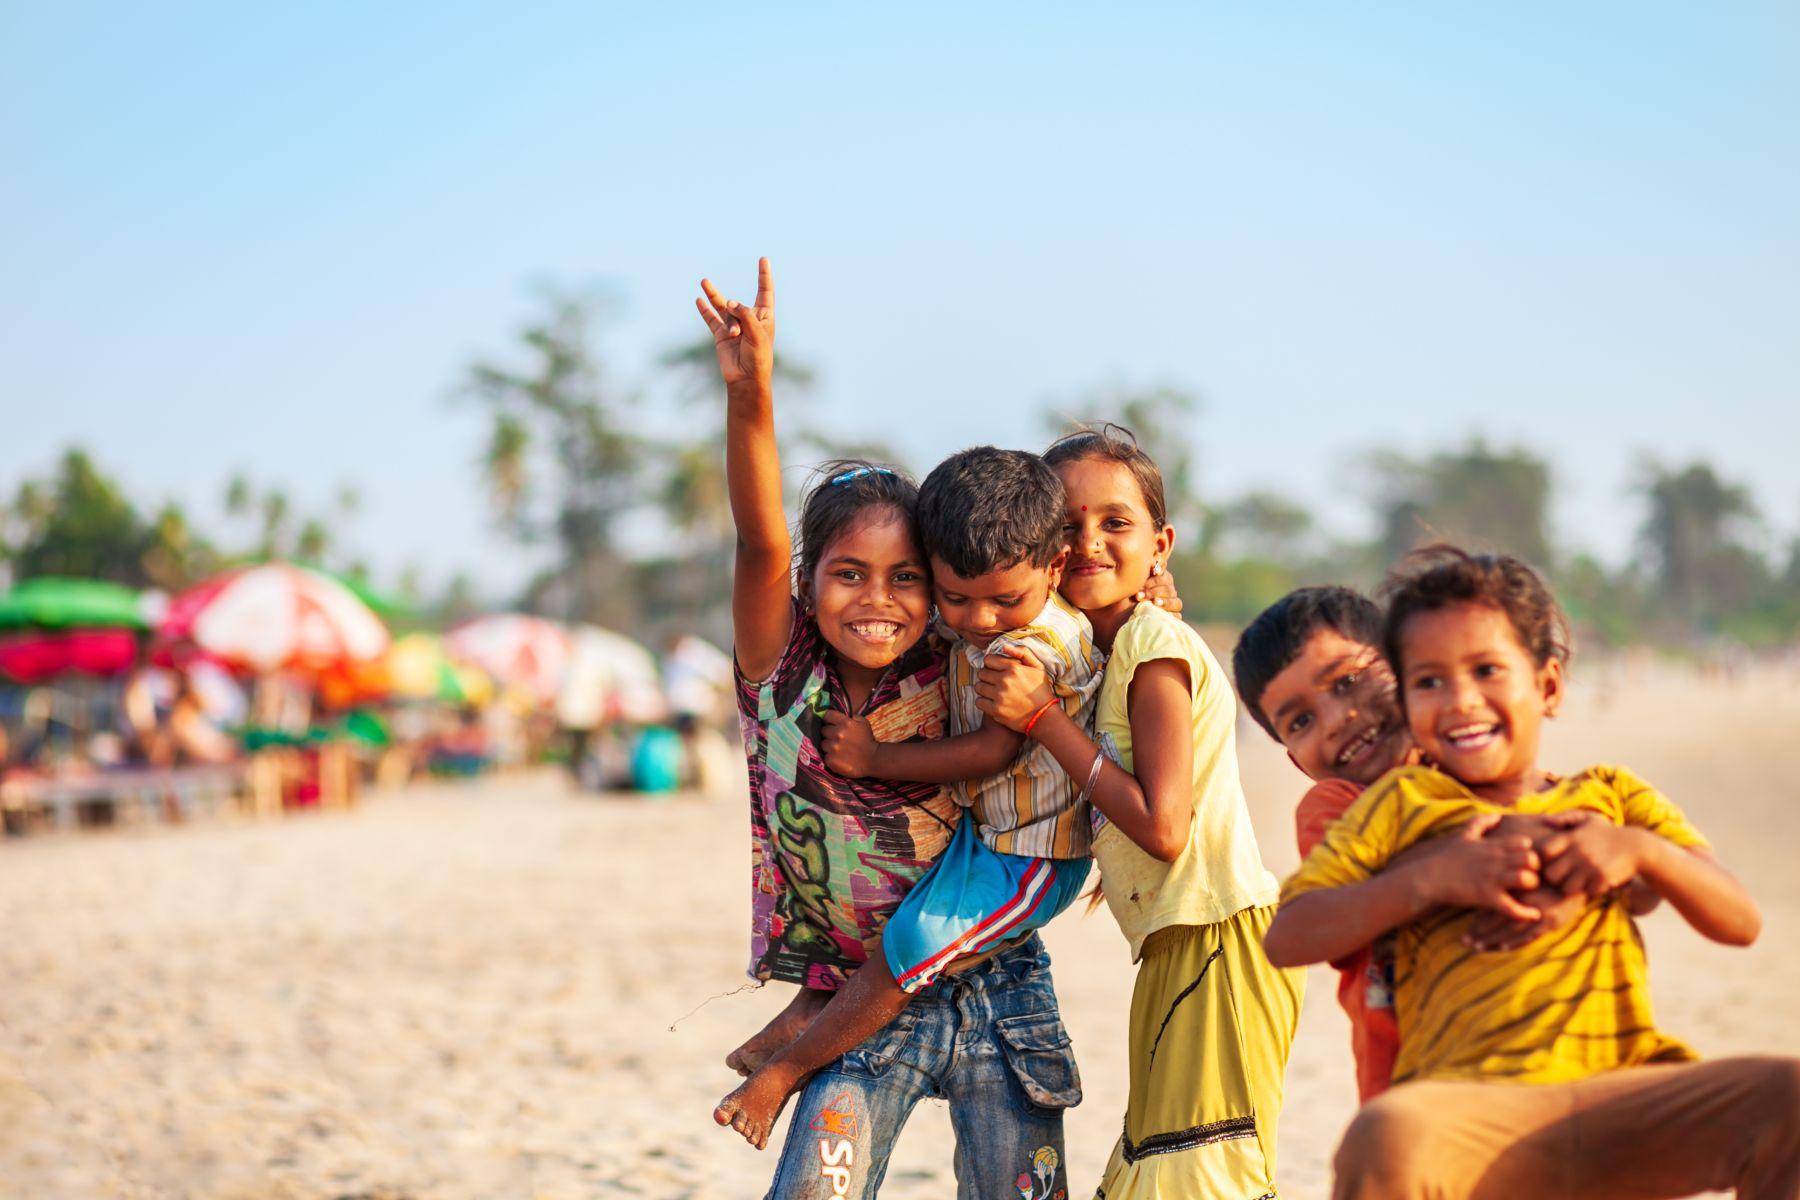 obyvatelstvo Indie